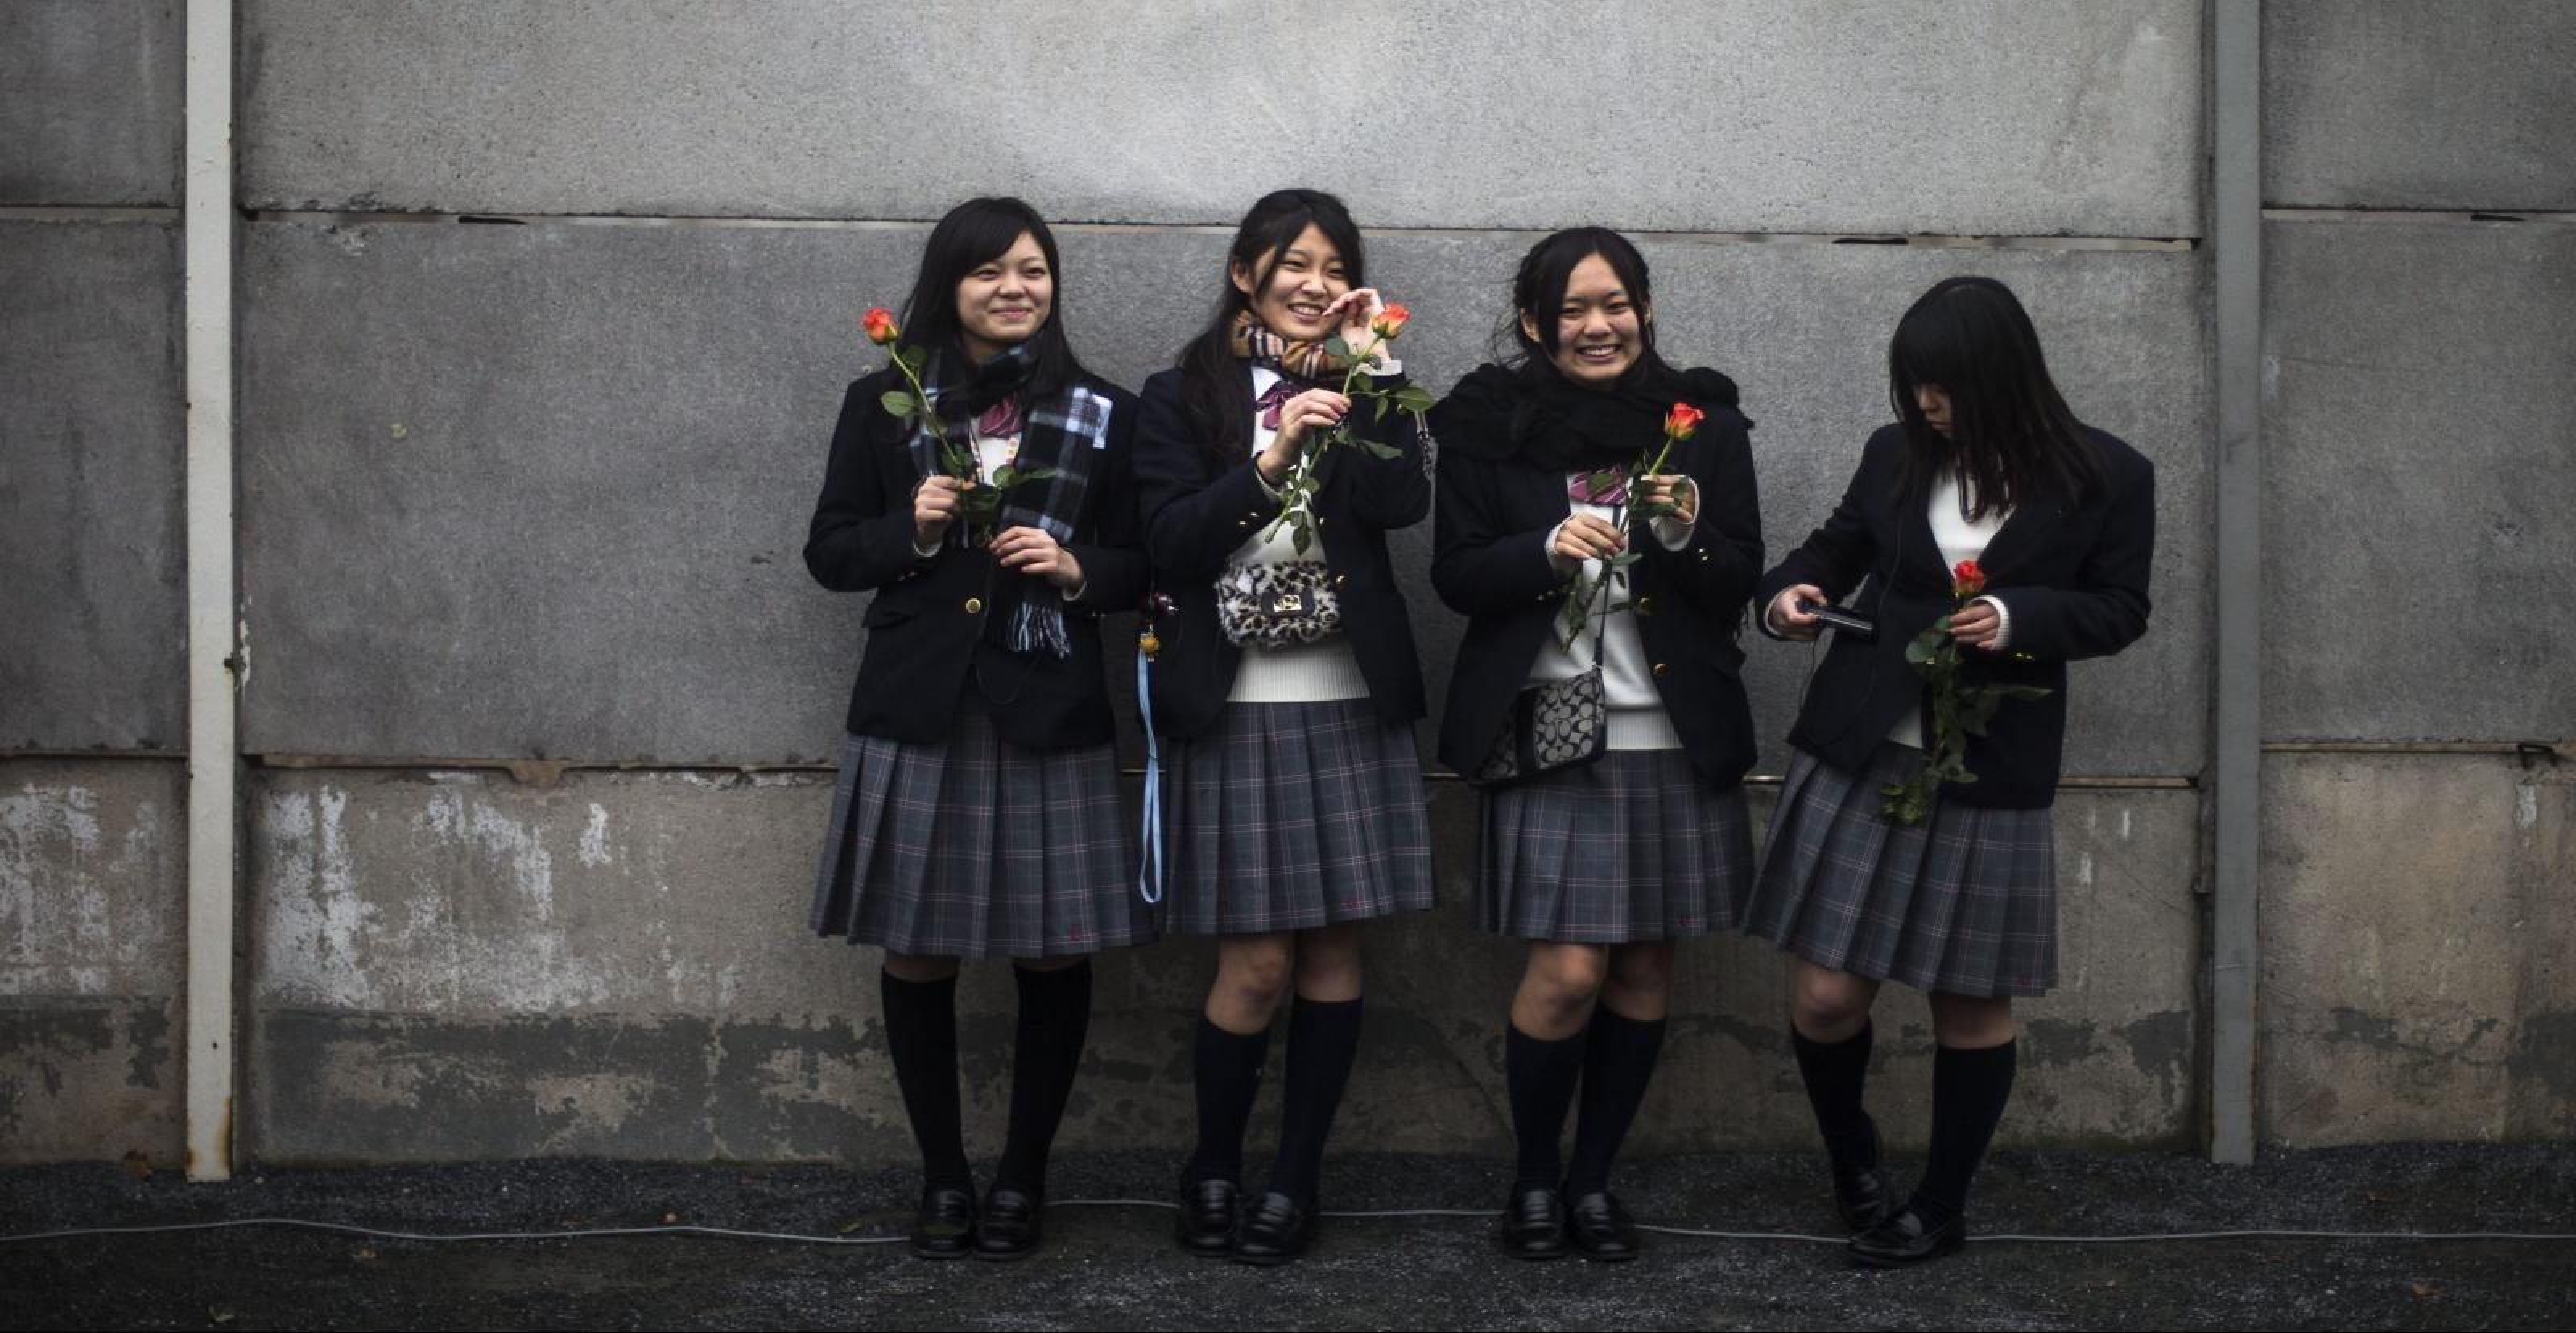 Gay dating sites Japanissa